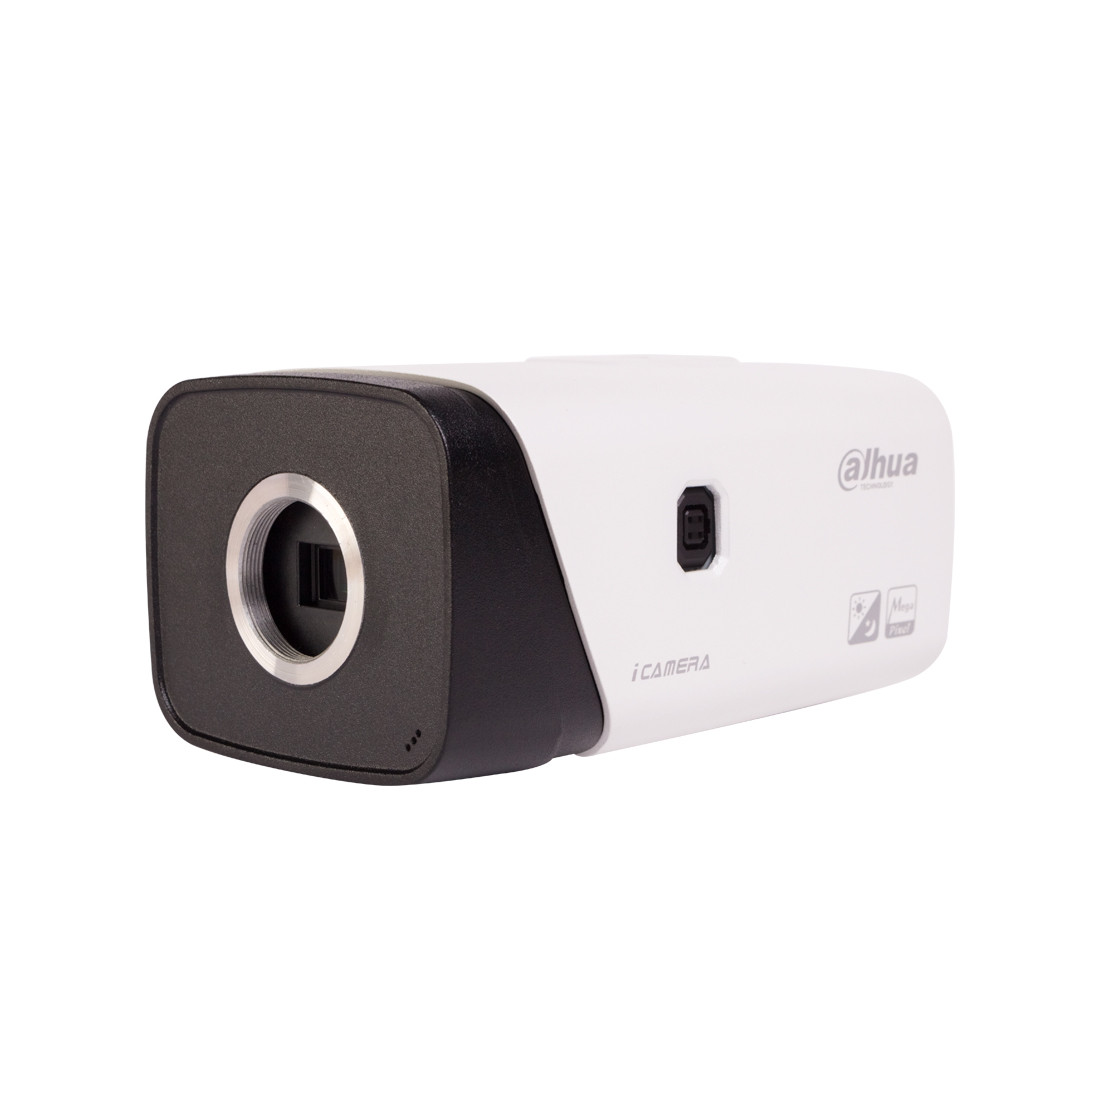 Dahua Классическая сетевая камера DH-IPC-HF5431EP-E